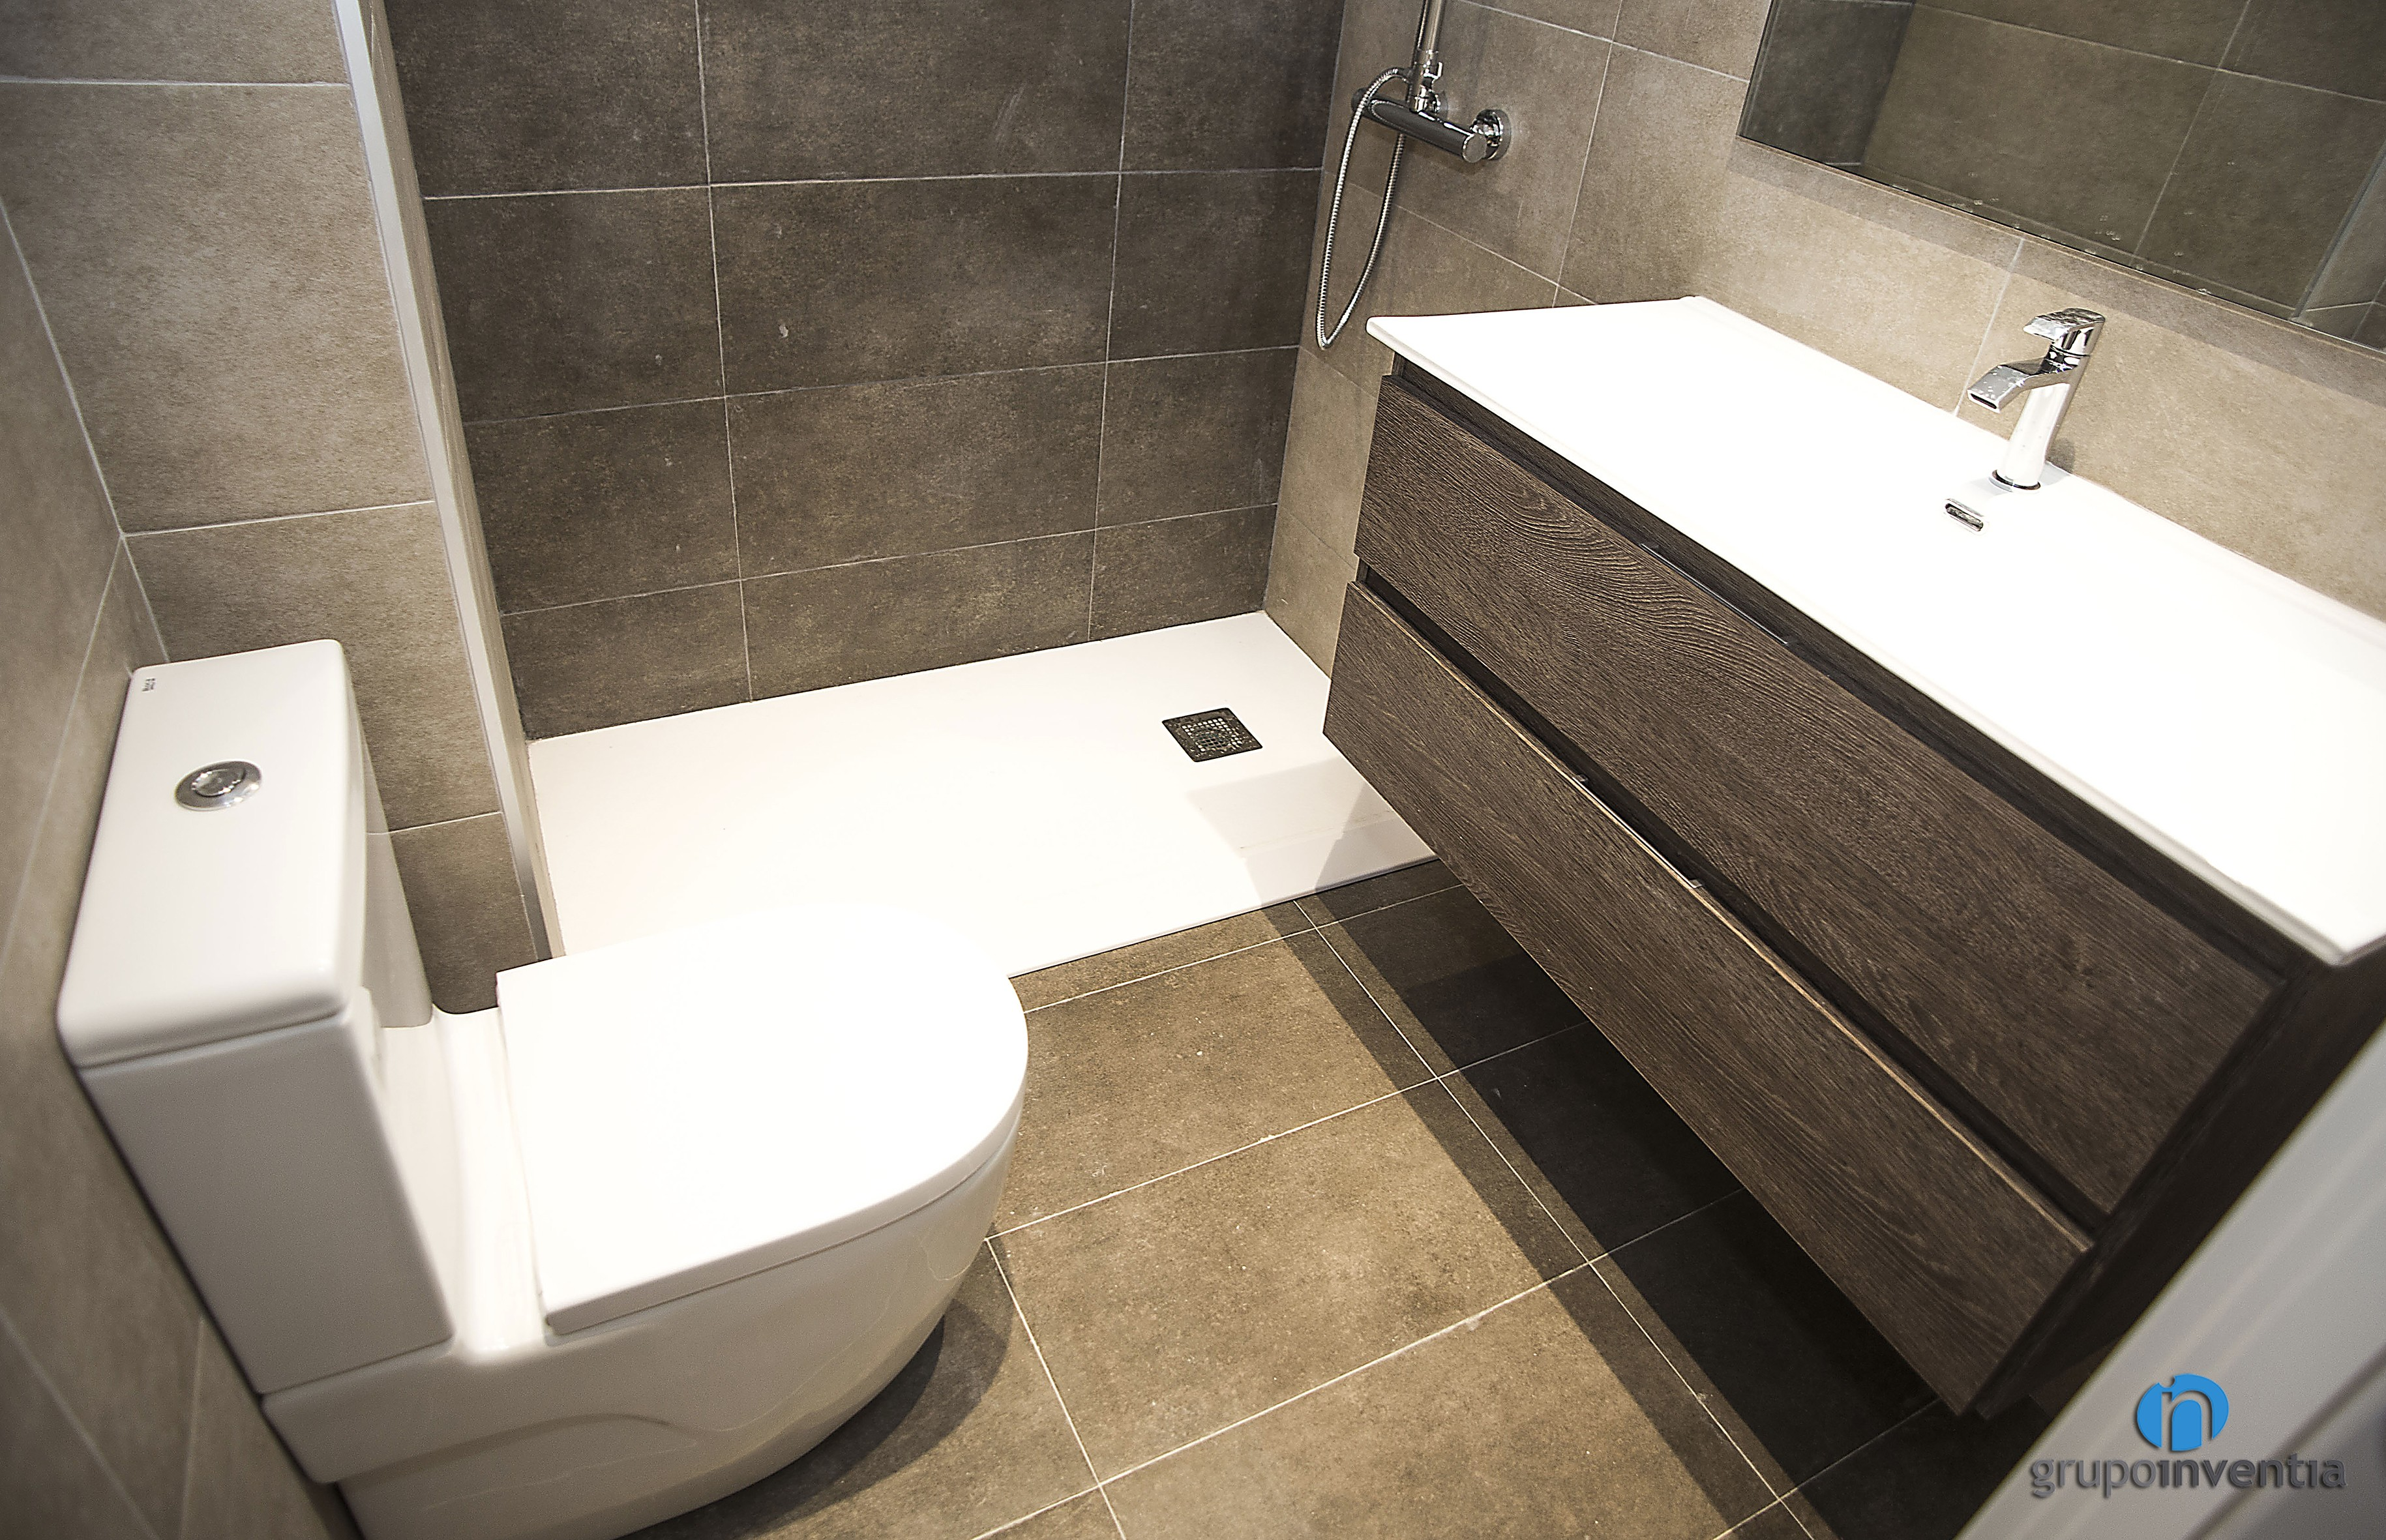 pavimento cuarto de baño Archives - Grupo Inventia